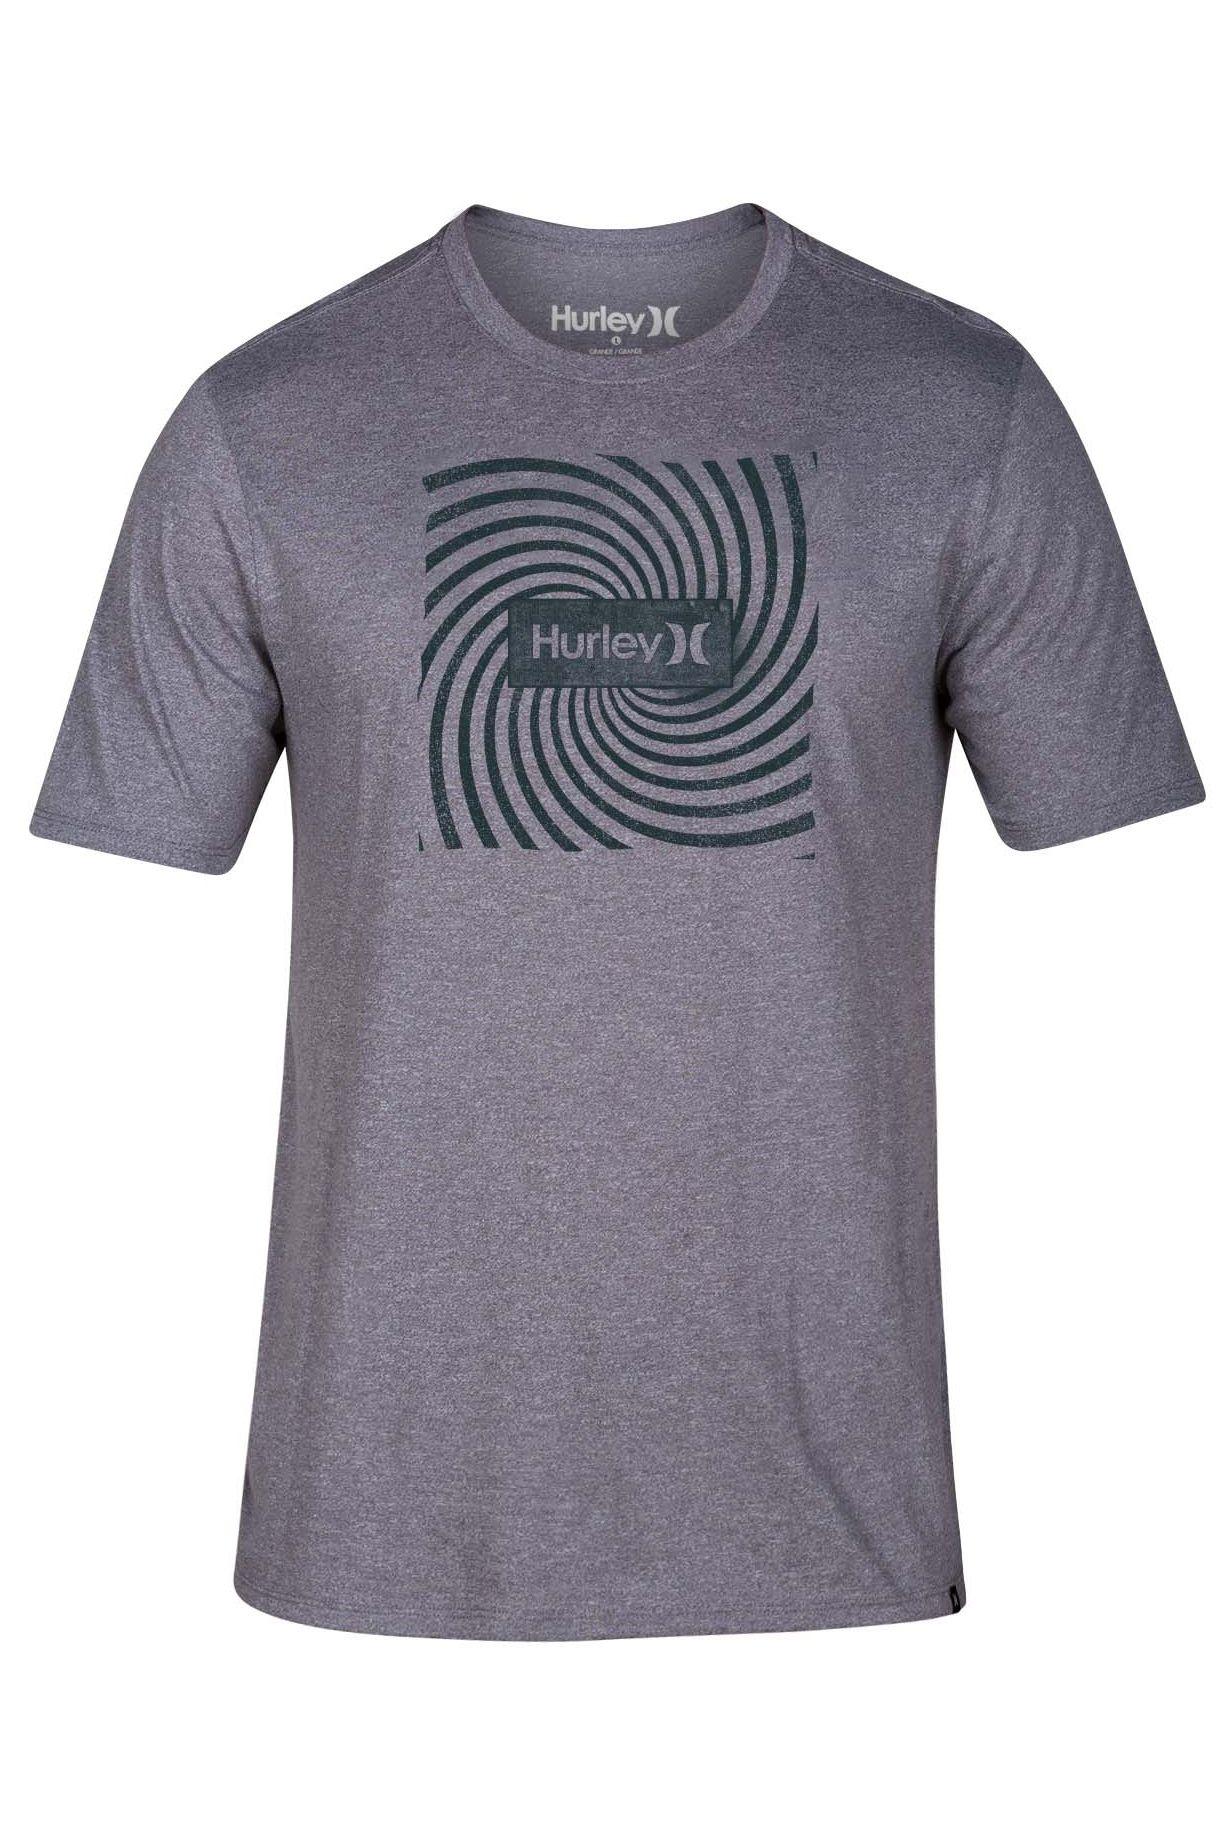 Hurley T-Shirt SIRO ABYSS Dark Grey Htr